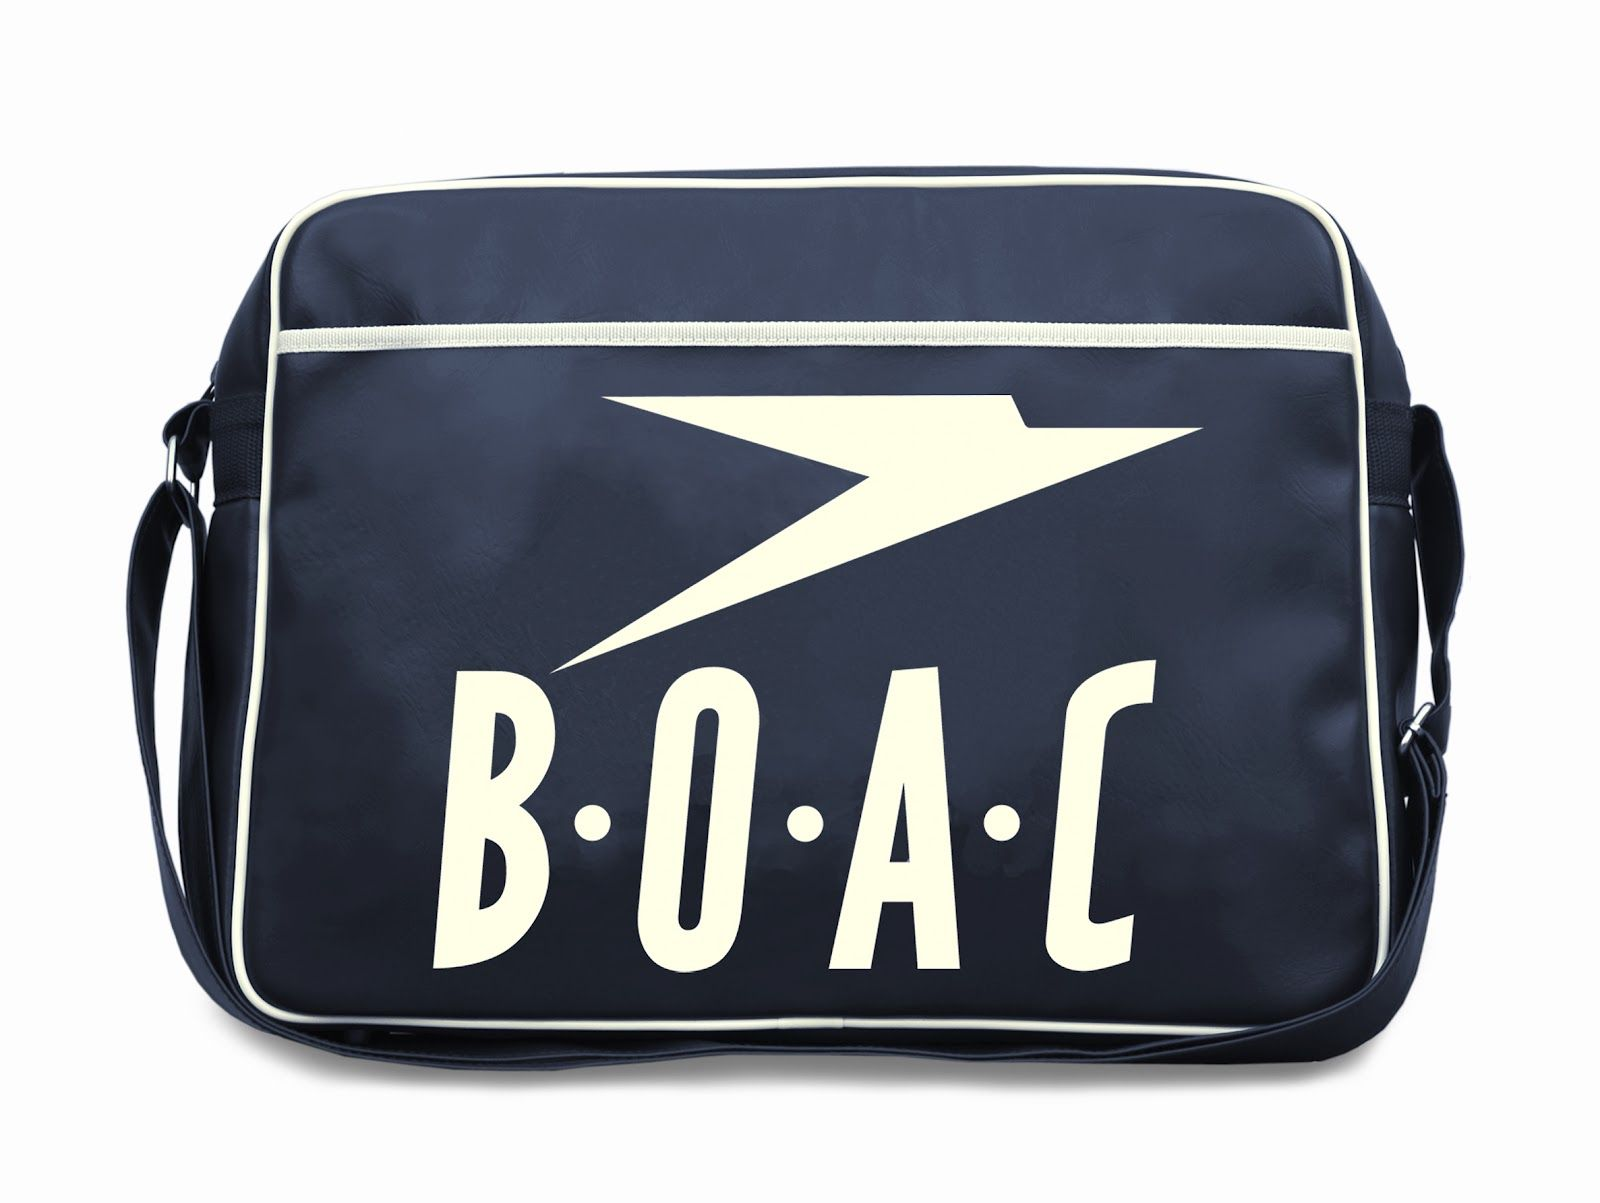 12a0cf6d1d BOAC  Retro Airline Bags Viajes En Avión